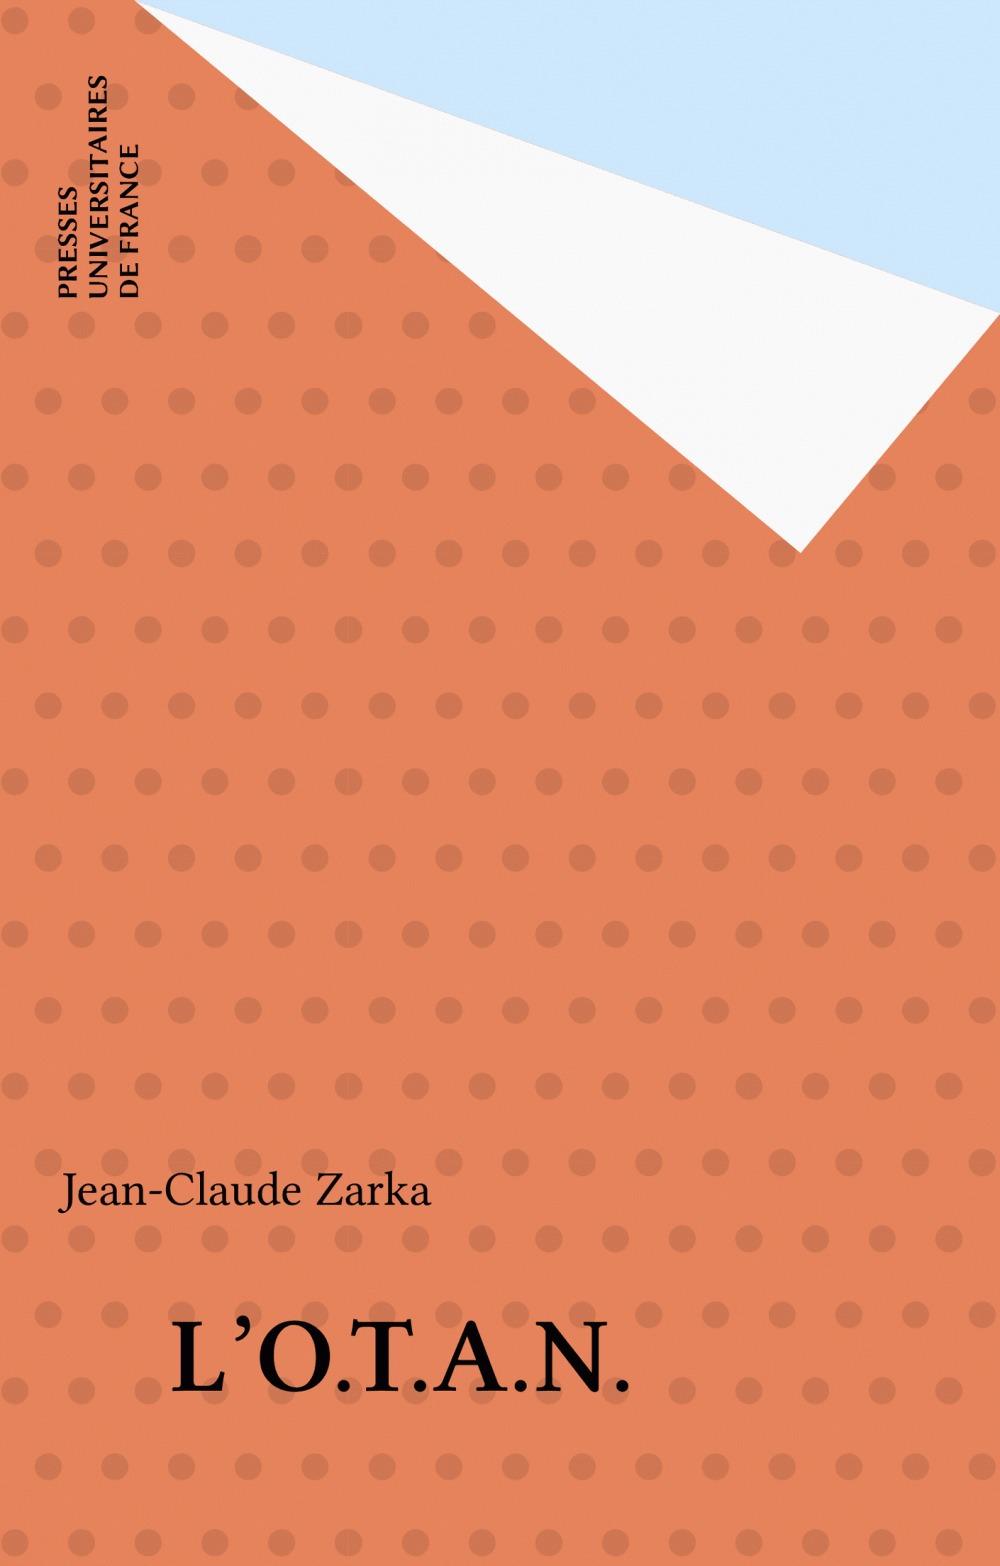 Jean-Claude Zarka L'O.T.A.N.